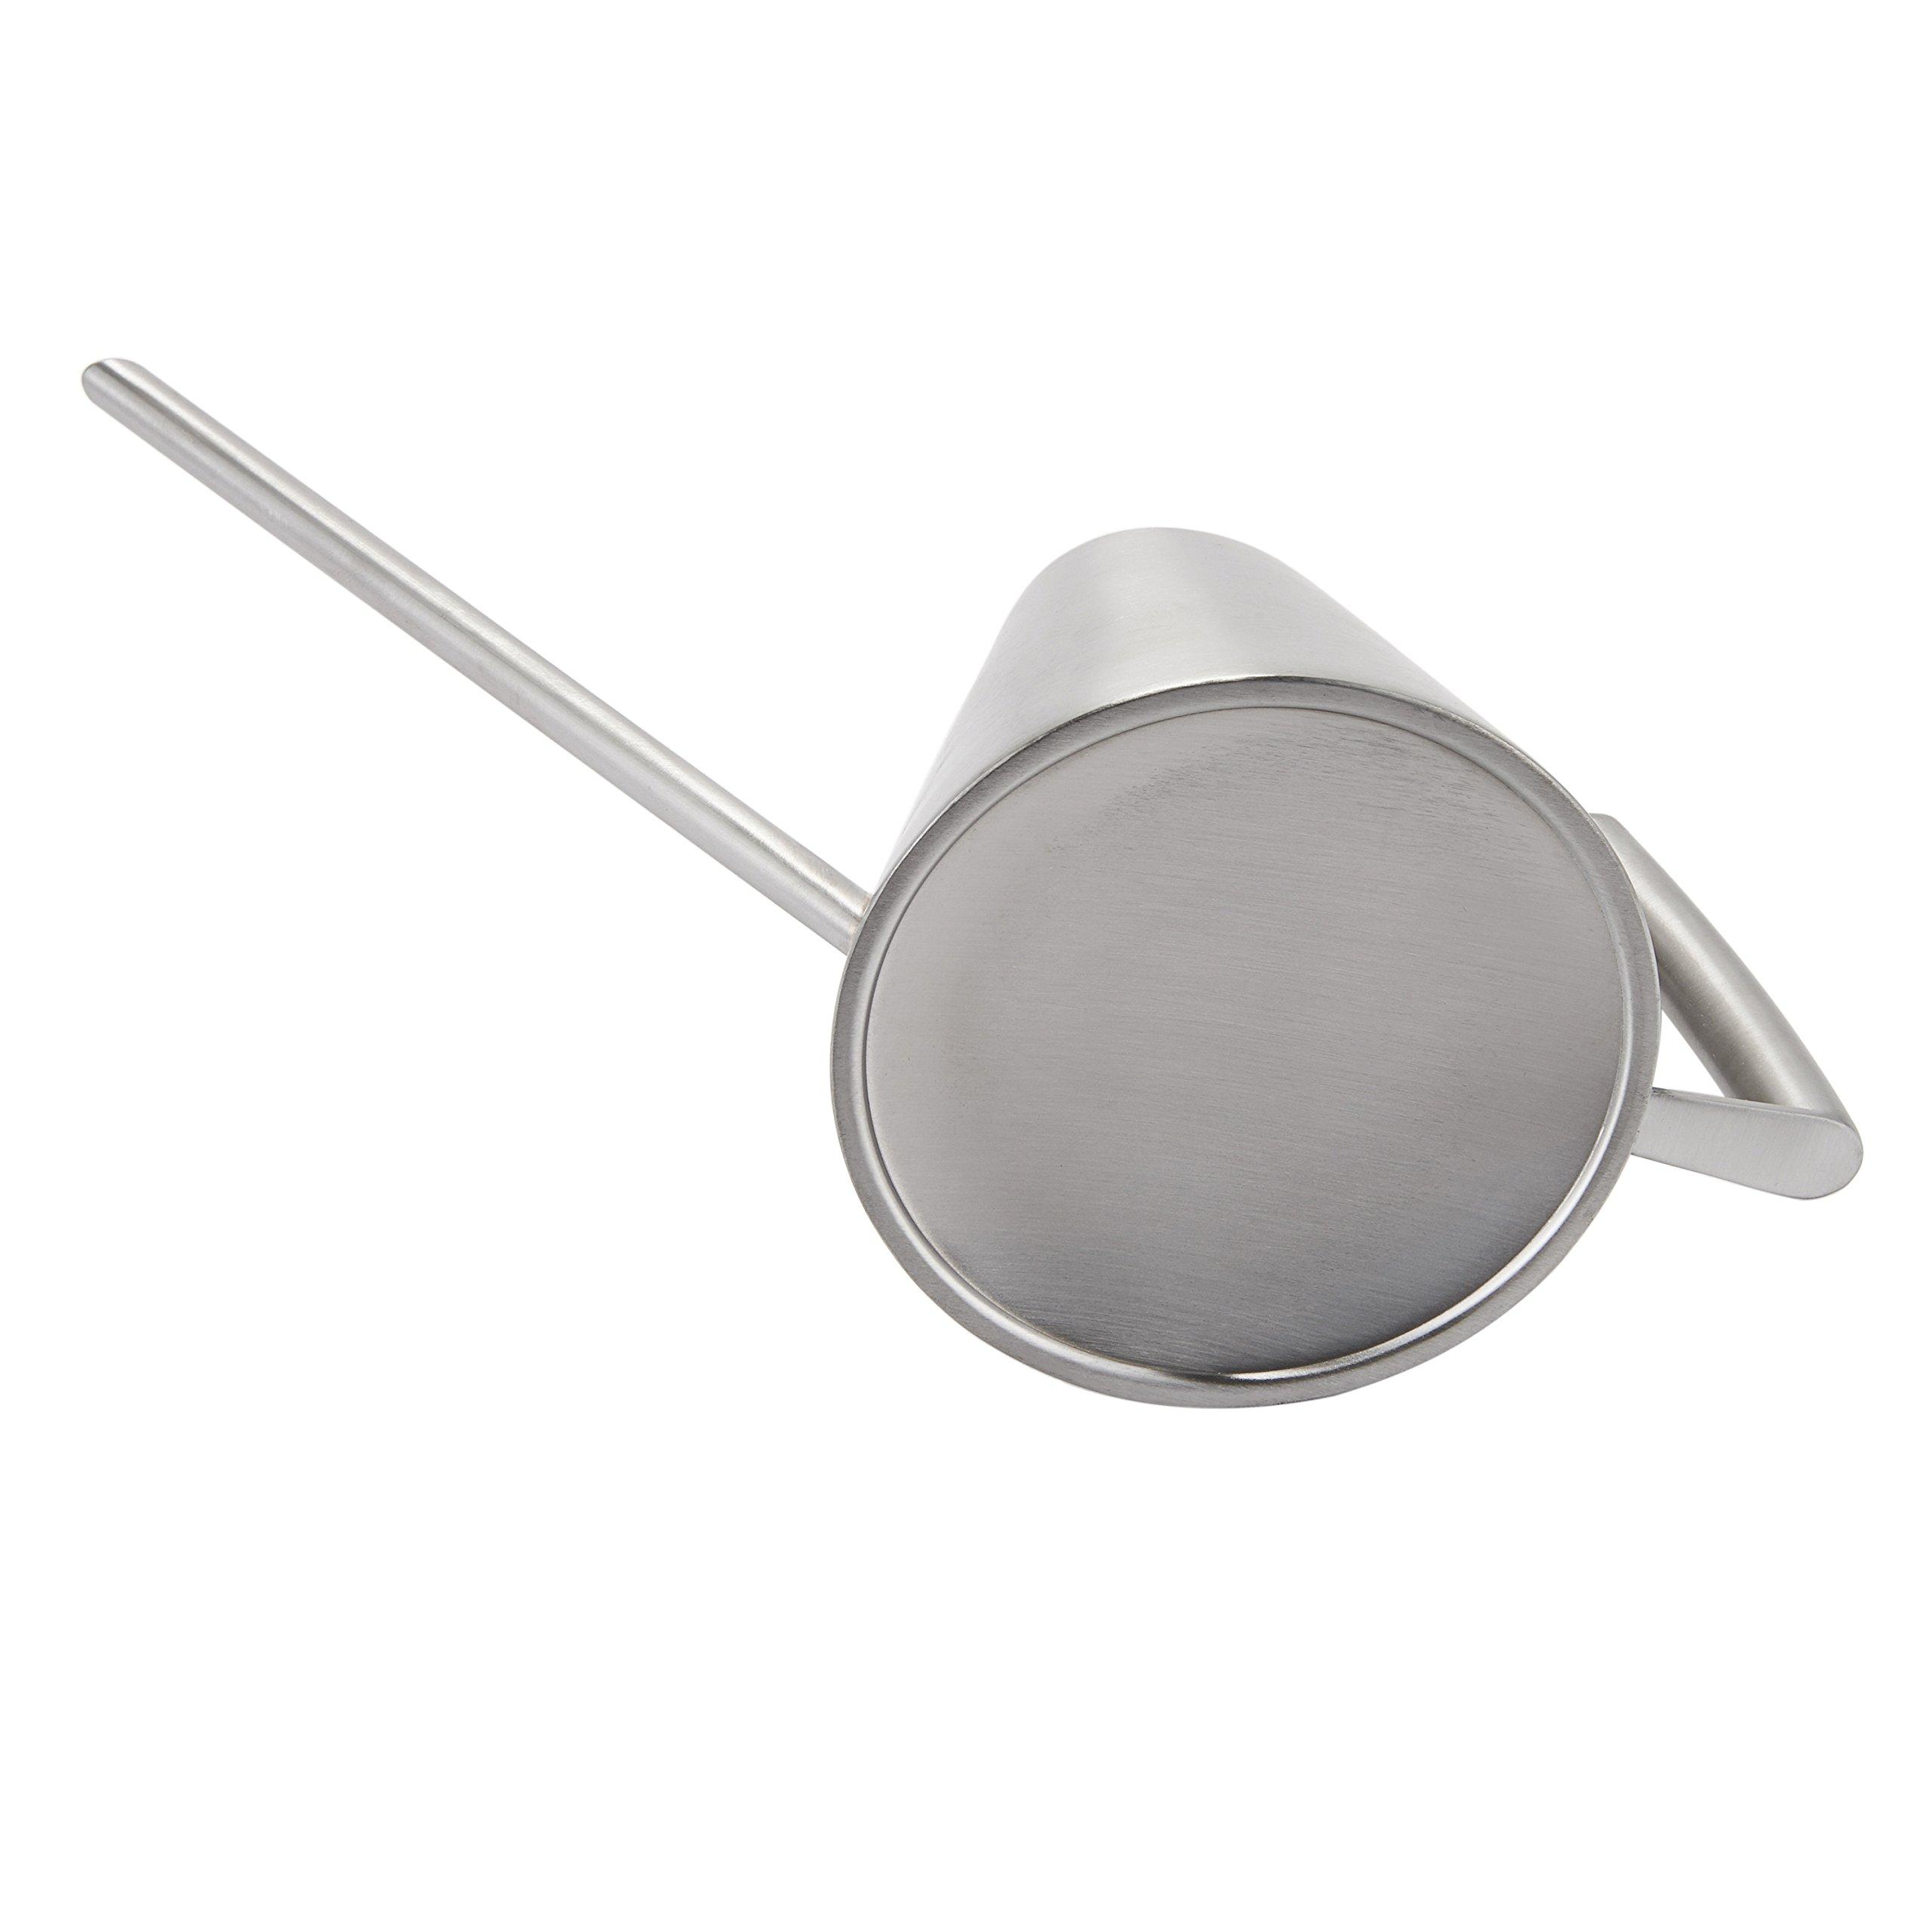 Gregarder Stainless Steel Watering Can Pot, 400ML by Asvert (Image #7)